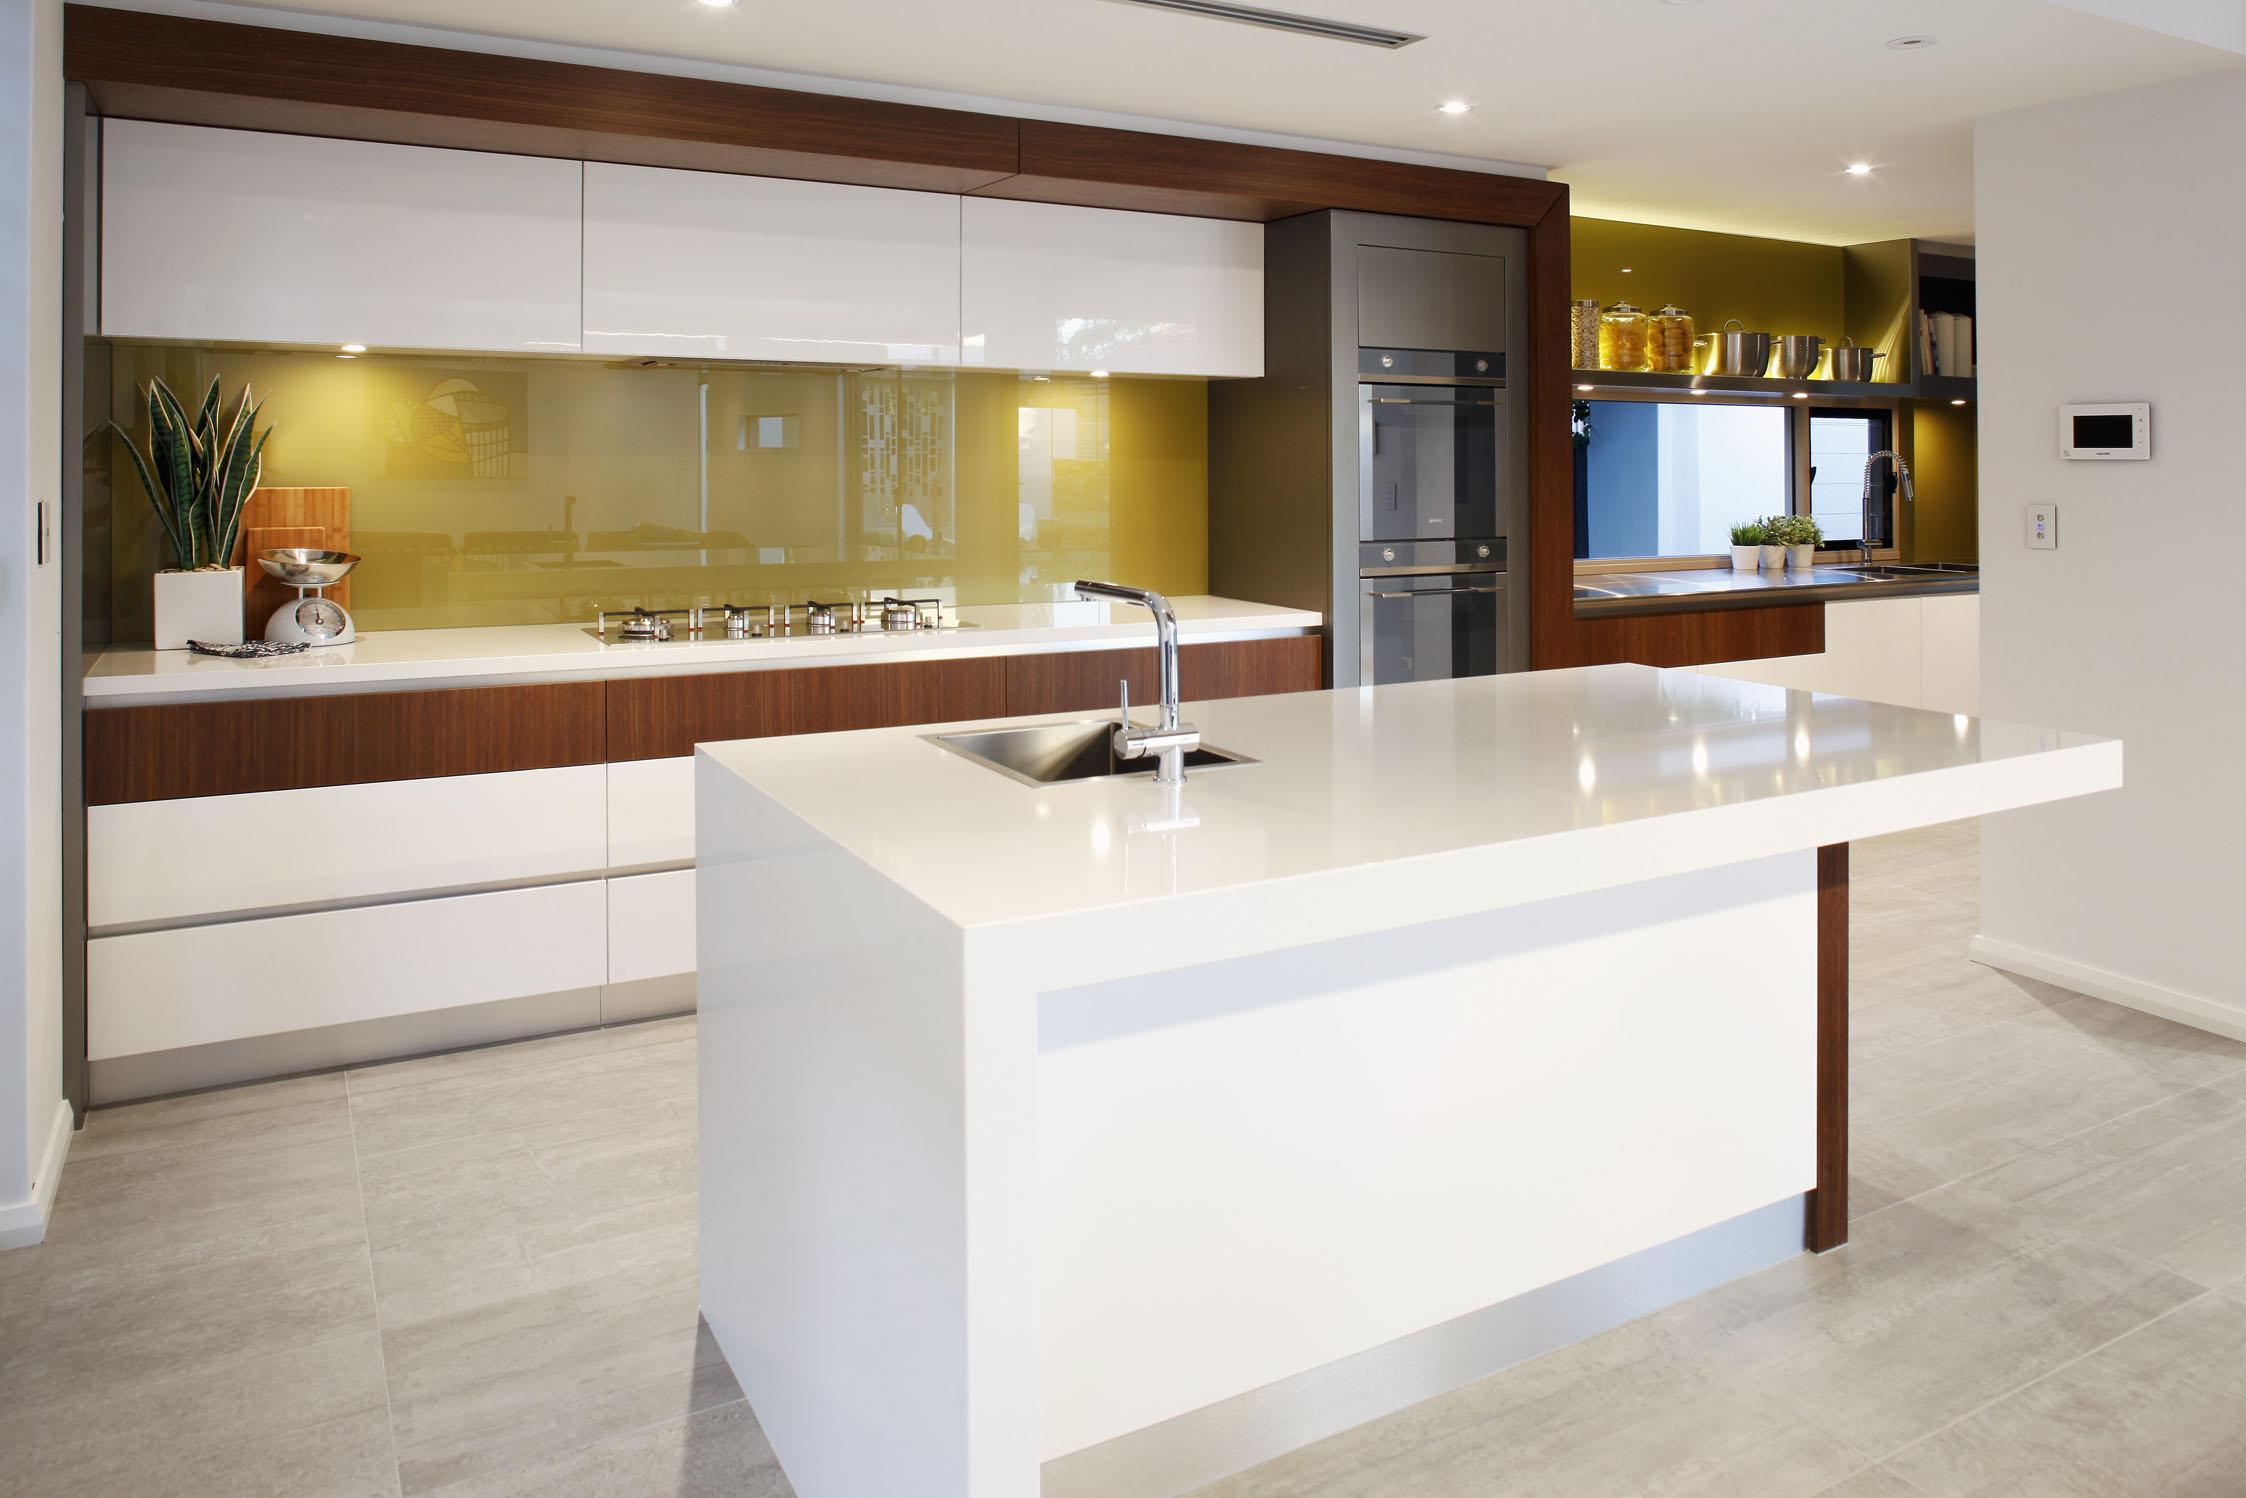 winner craig sheiles homes and international cabinets